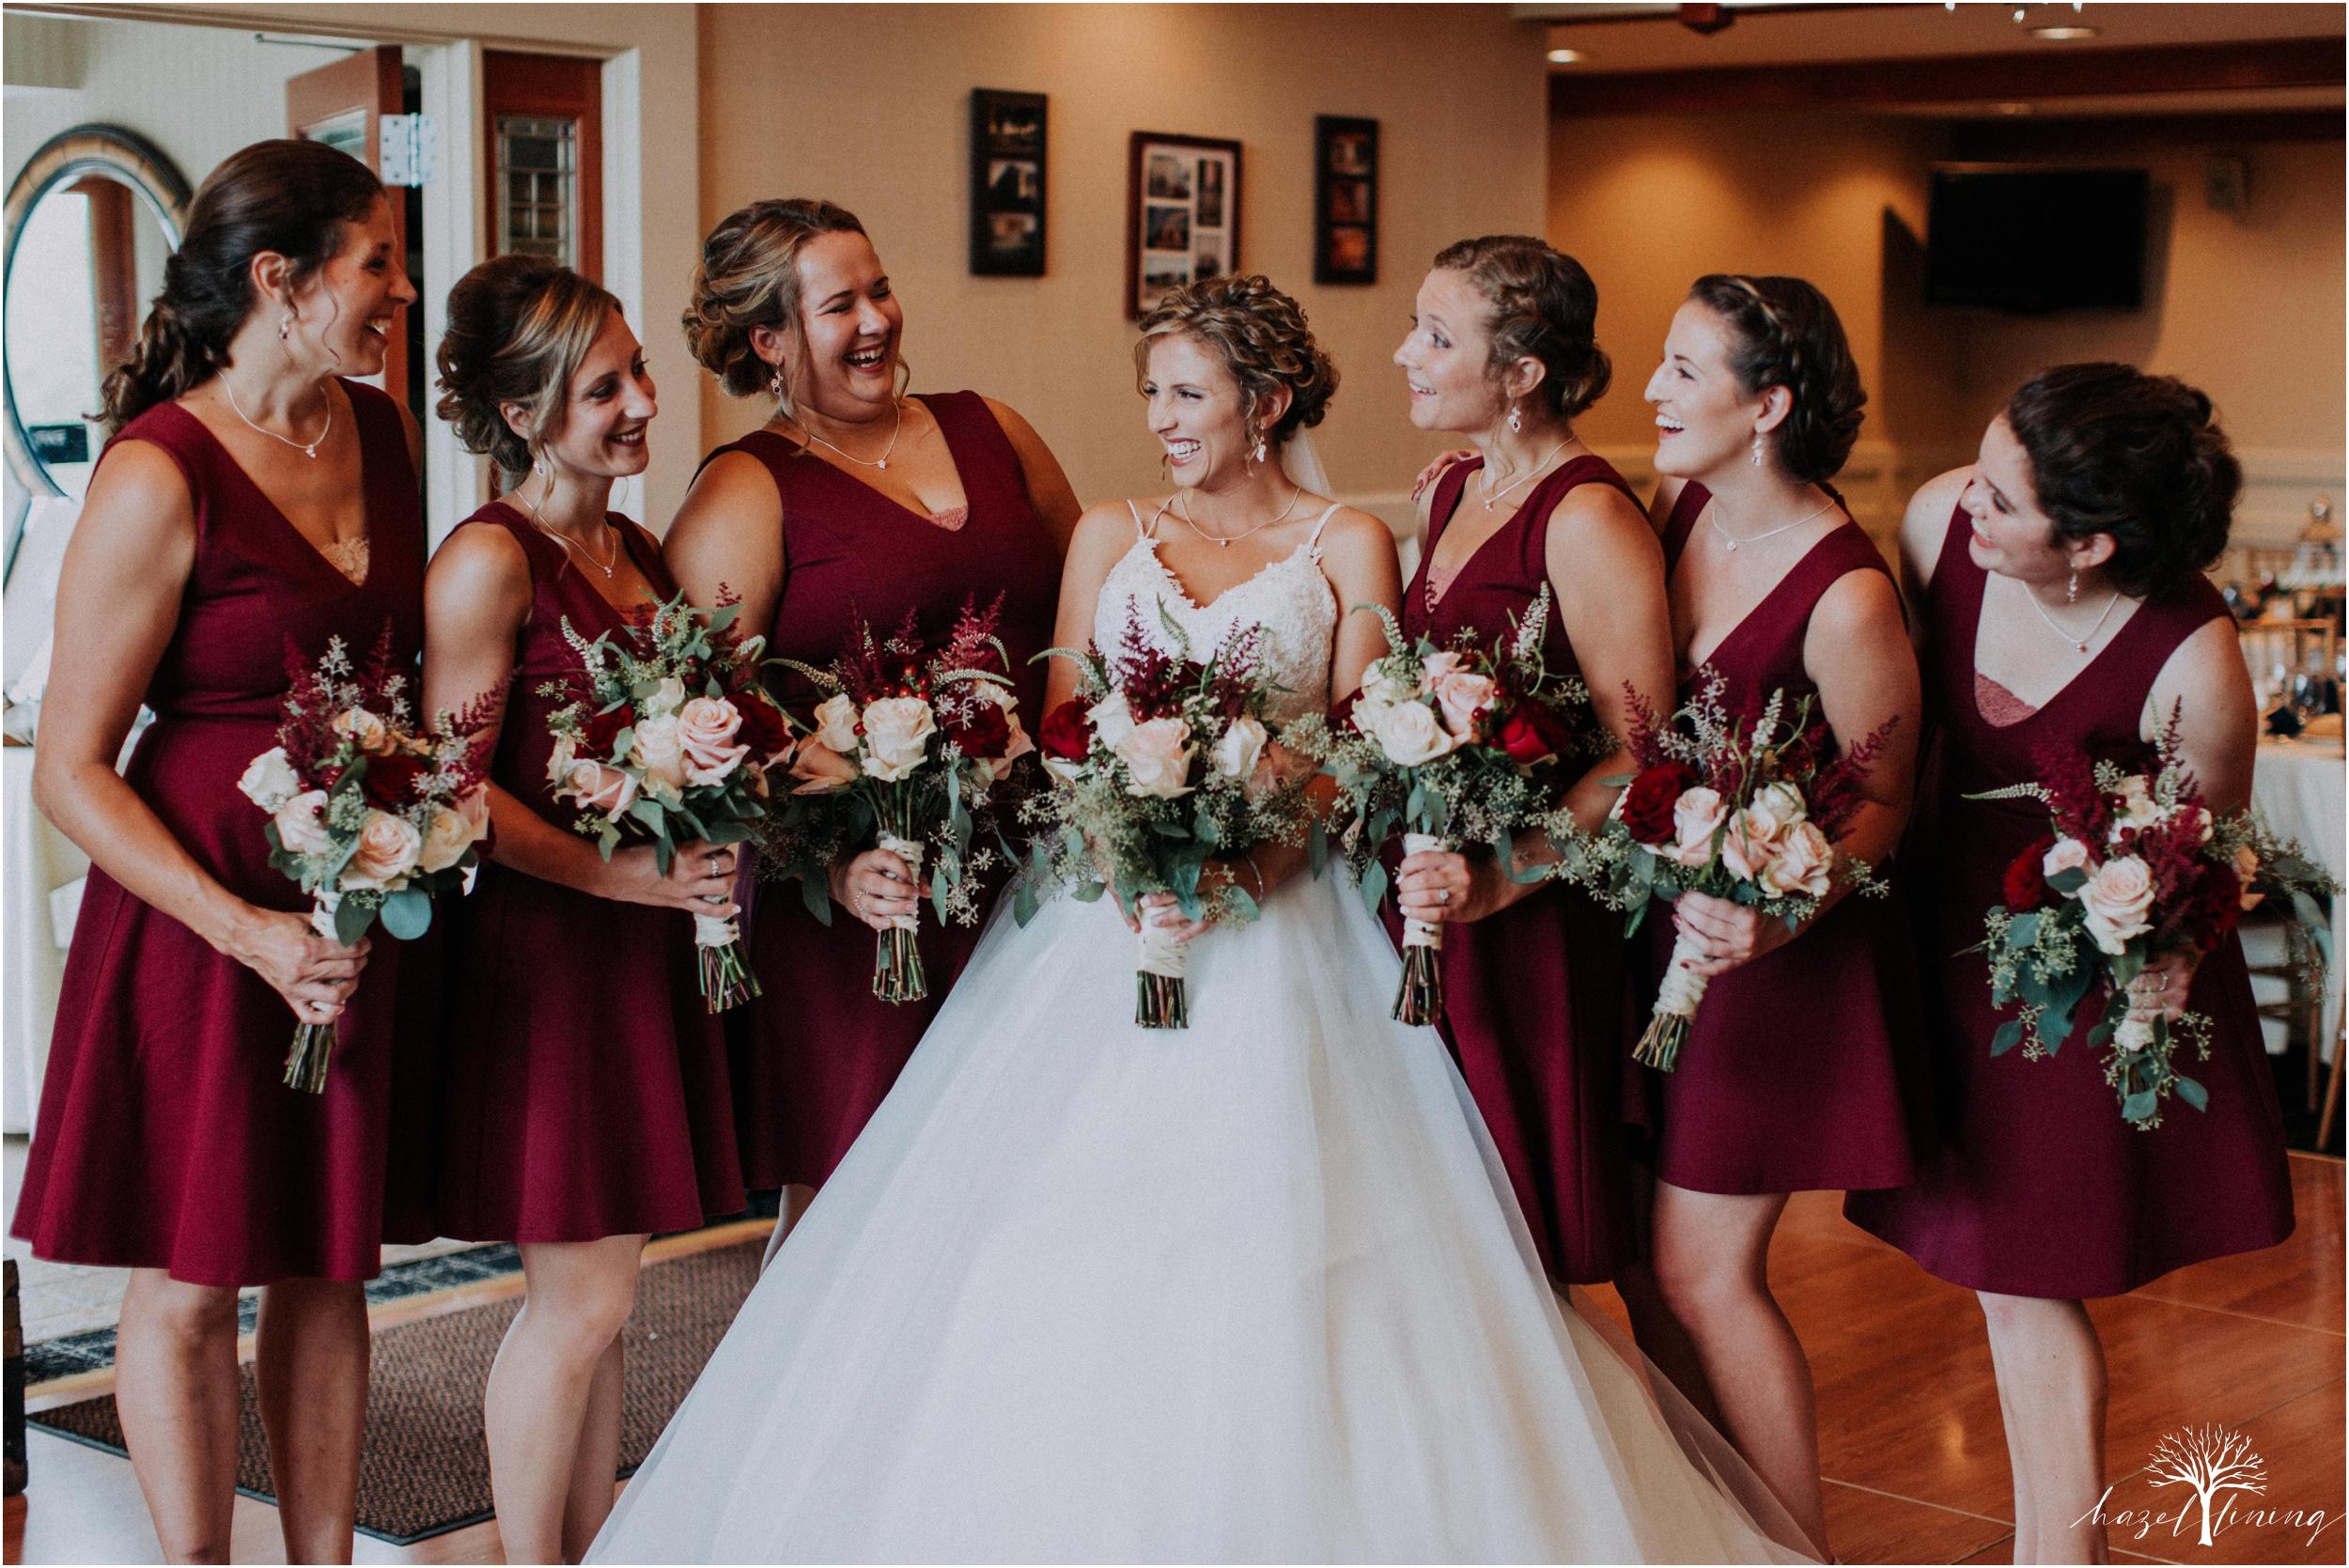 jonathan-weibel-becky-haywood-loft-at-sweetwater-cc-pennsburg-pennsylvania-rainy-day-summer-wedding-hazel-lining-travel-wedding-elopement-photography_0029.jpg